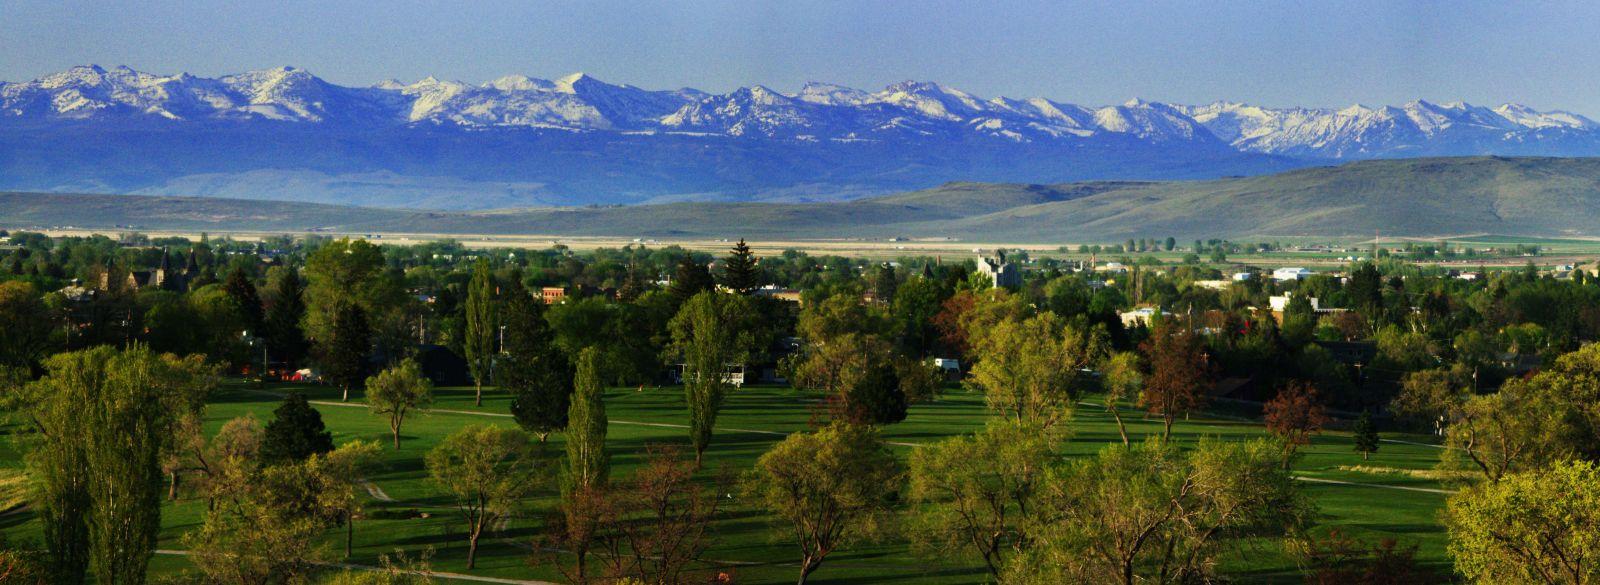 Quail Ridge Golf Course - Baker City, OR